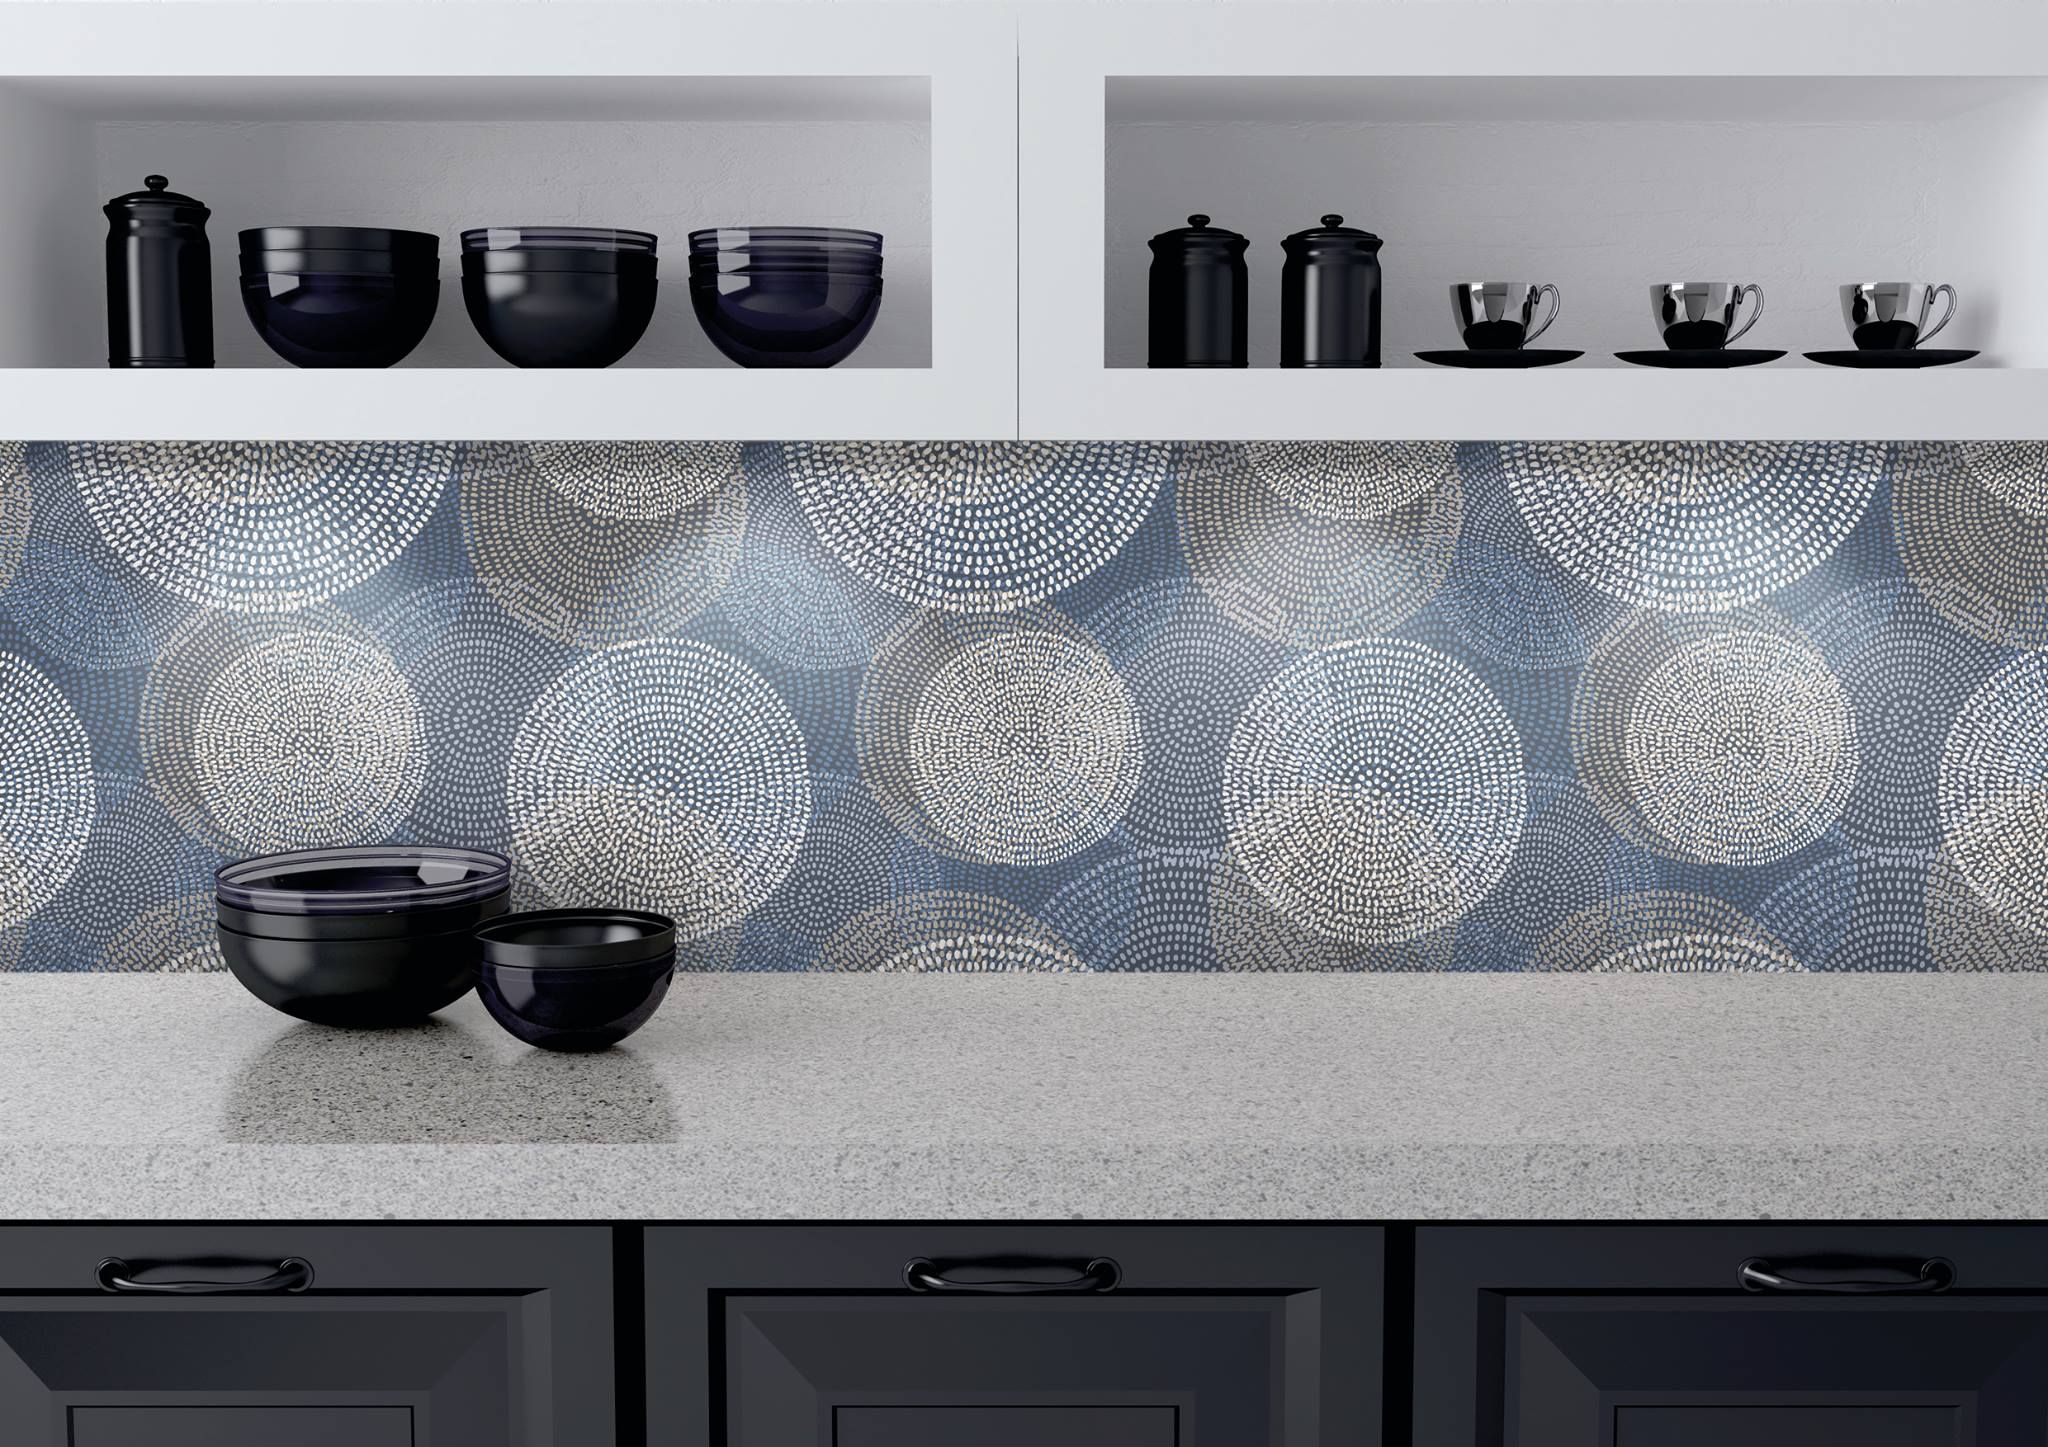 Select Kitchen Splashbacks With Images Kitchen Splashback